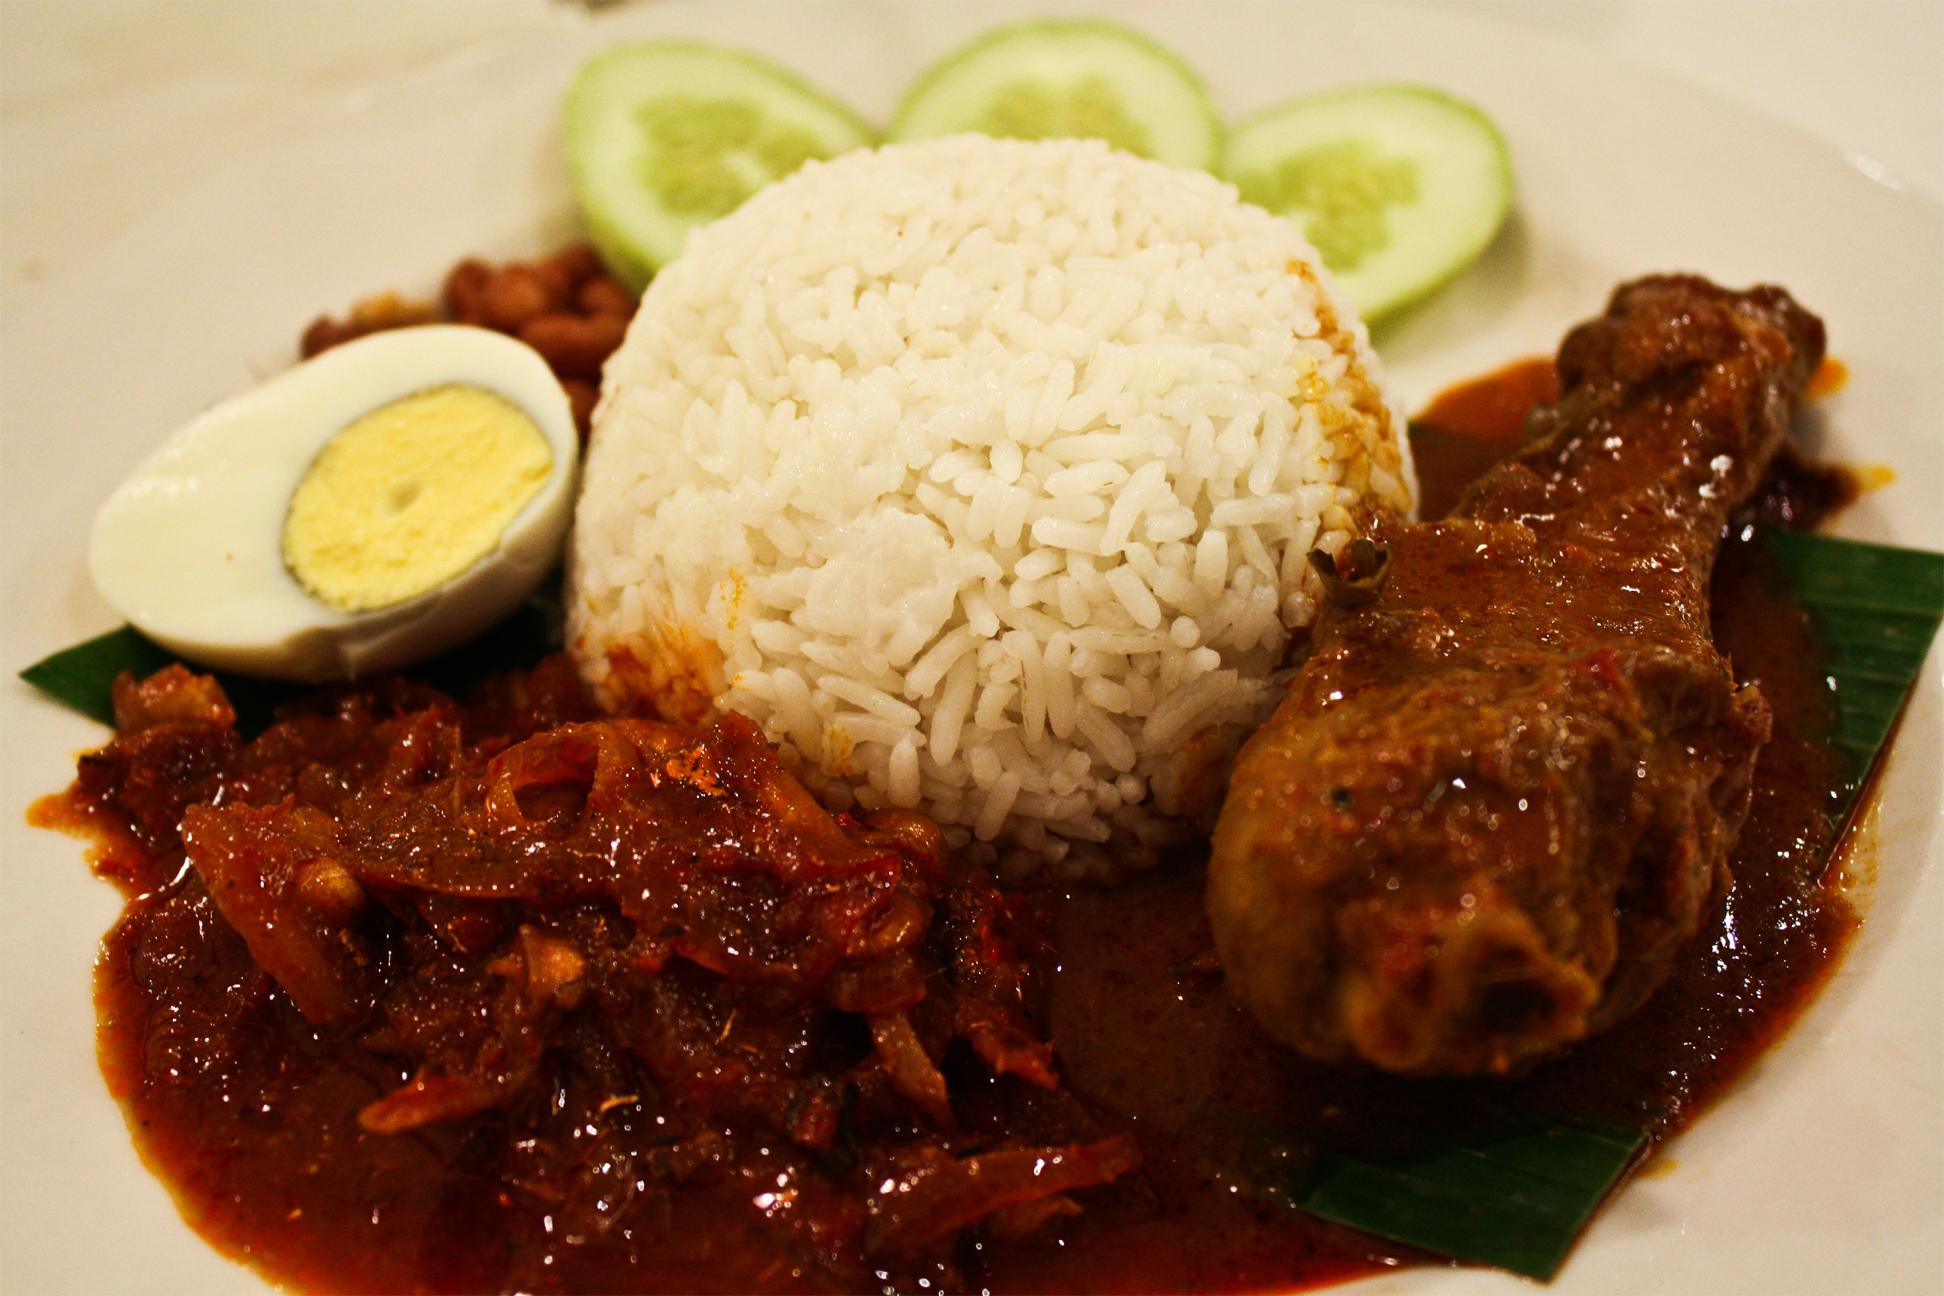 nasi lemak coconut milk sambal chili rich rice fried chicken cucumber singapore malaysia traditional hawker street food